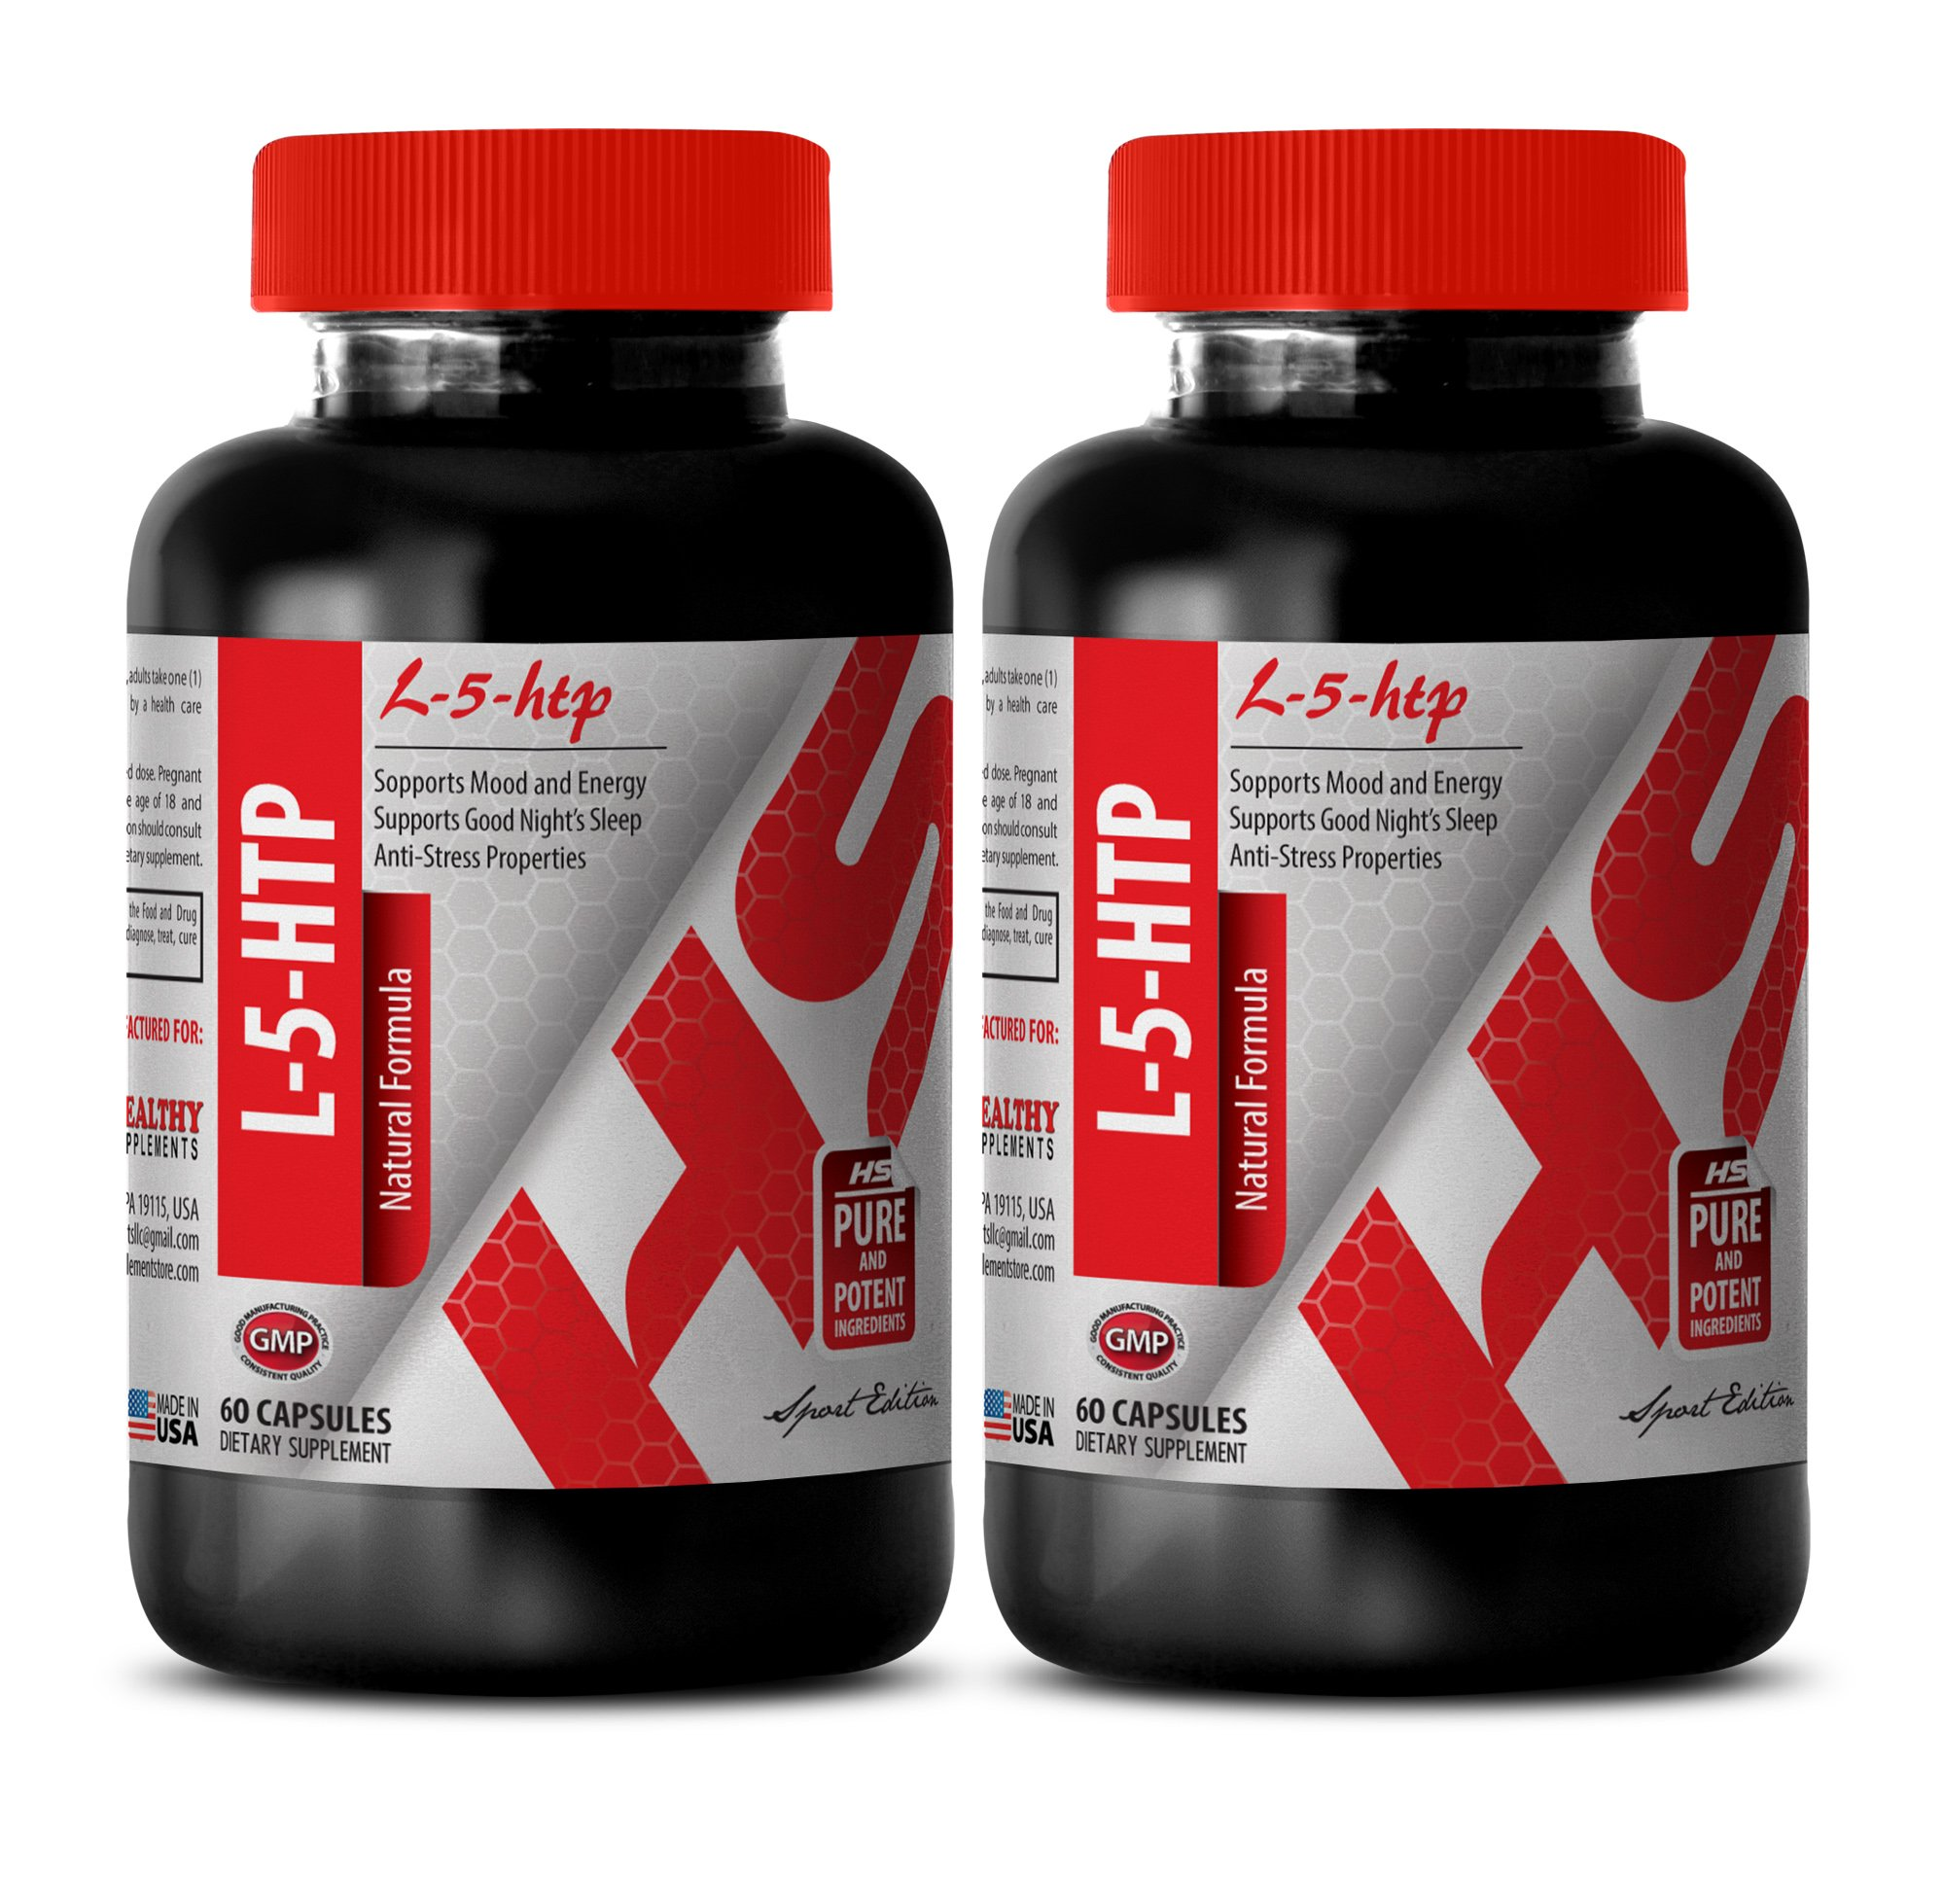 L-5 hydroxy tryptophan 200mg - 377 MG L-5-HTP NATURAL FORMULA - increase brain serotonin (2 Bottles)